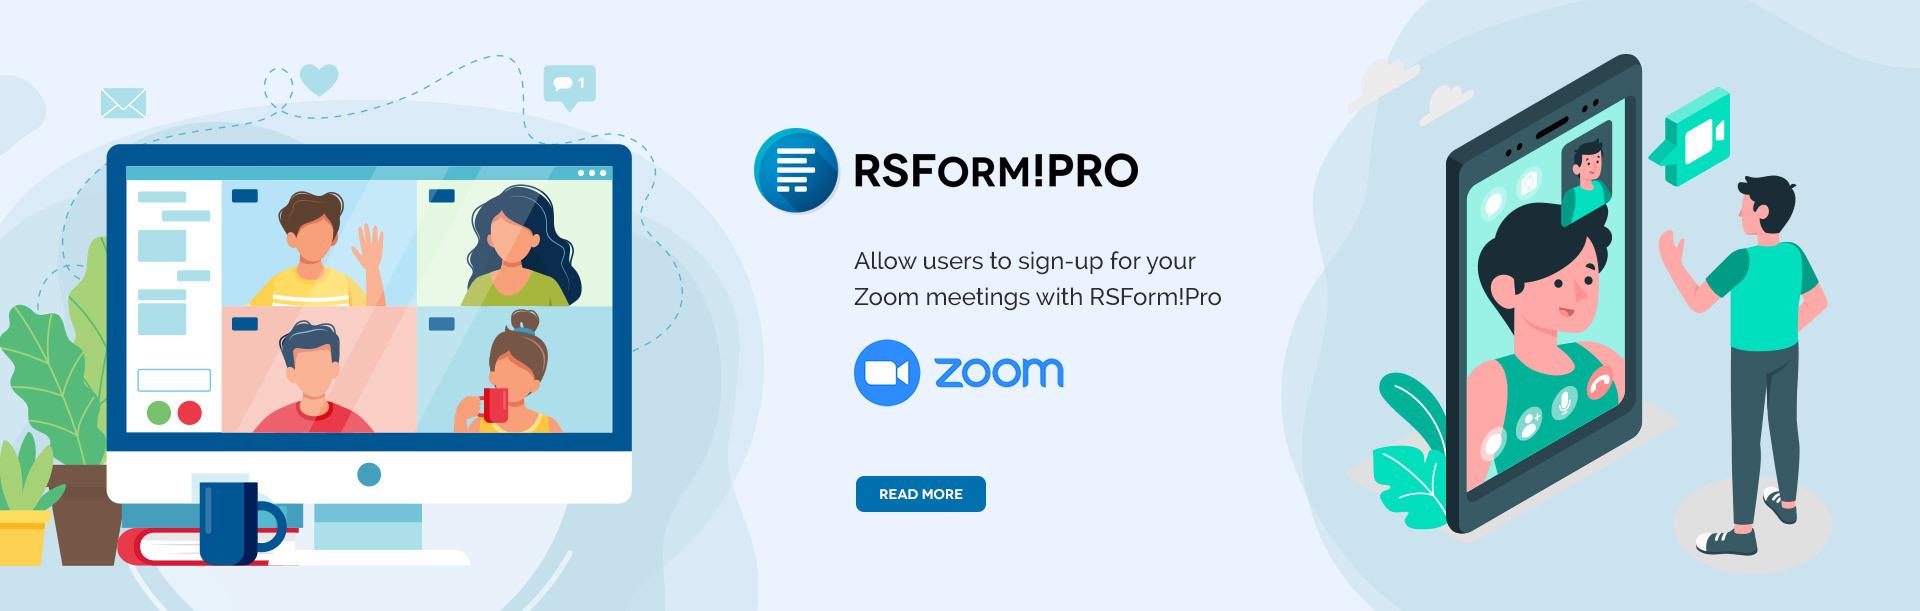 RSForm!Pro Zoom integration